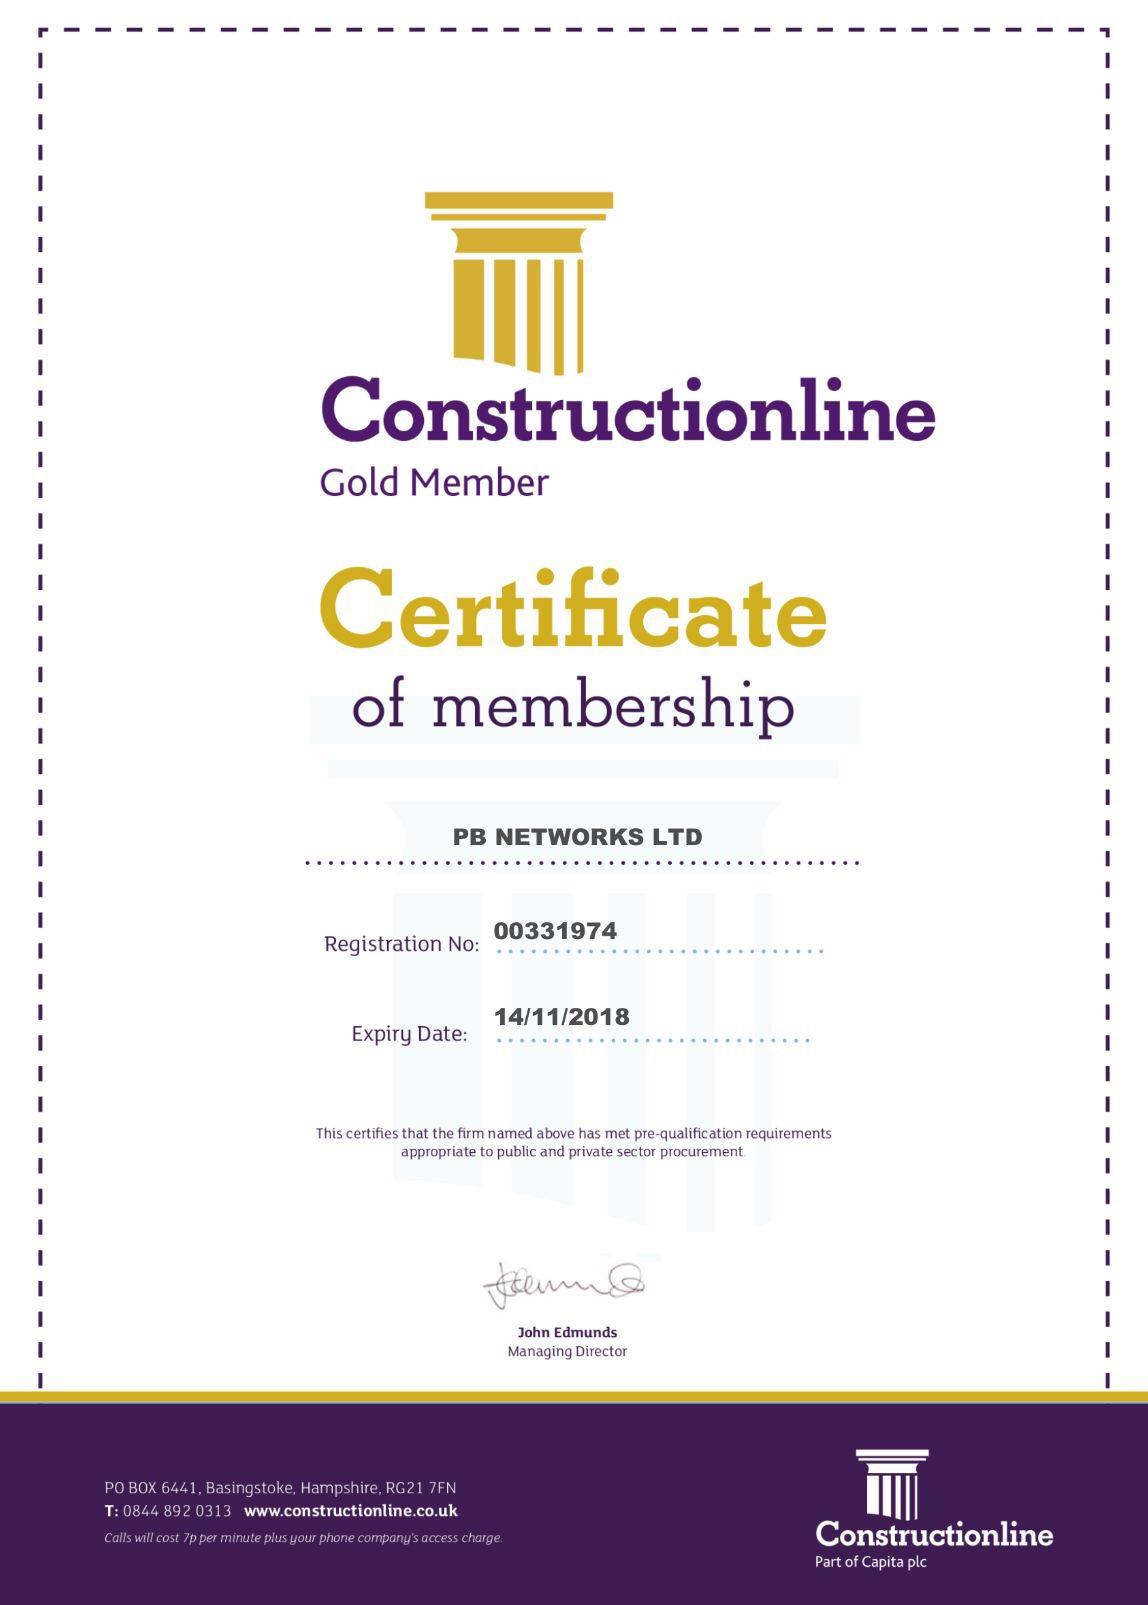 Constructionline accredited uk contractor